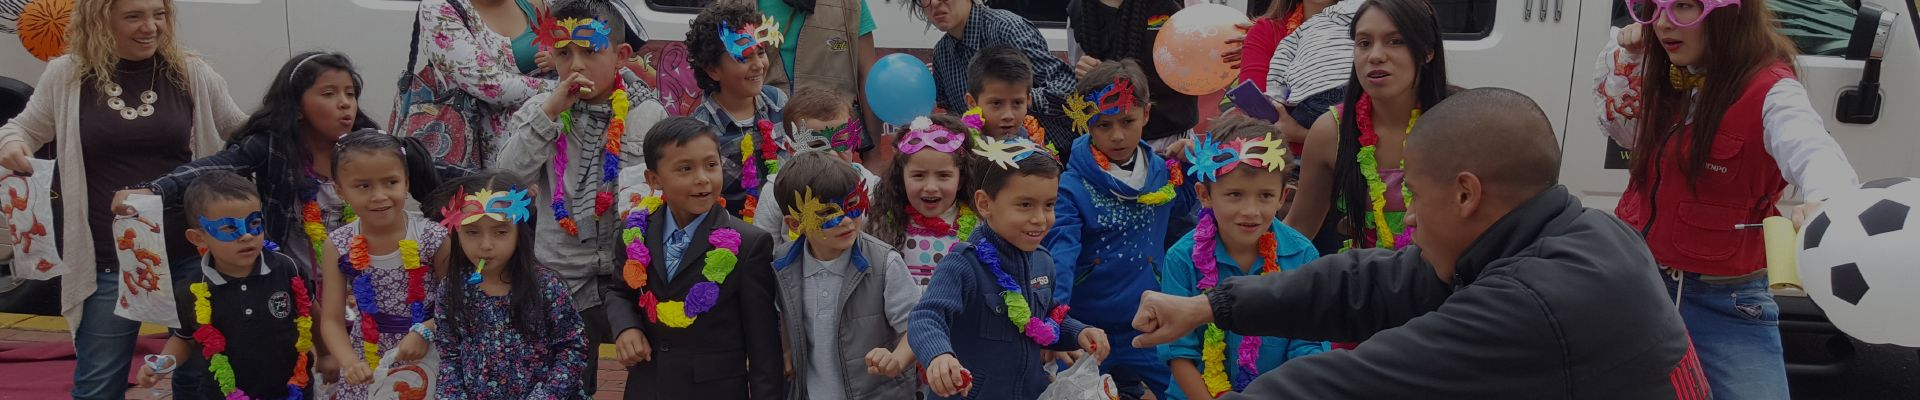 Alquiler limusinas barcelona fiestas infantiles en for Fiestas tematicas bcn